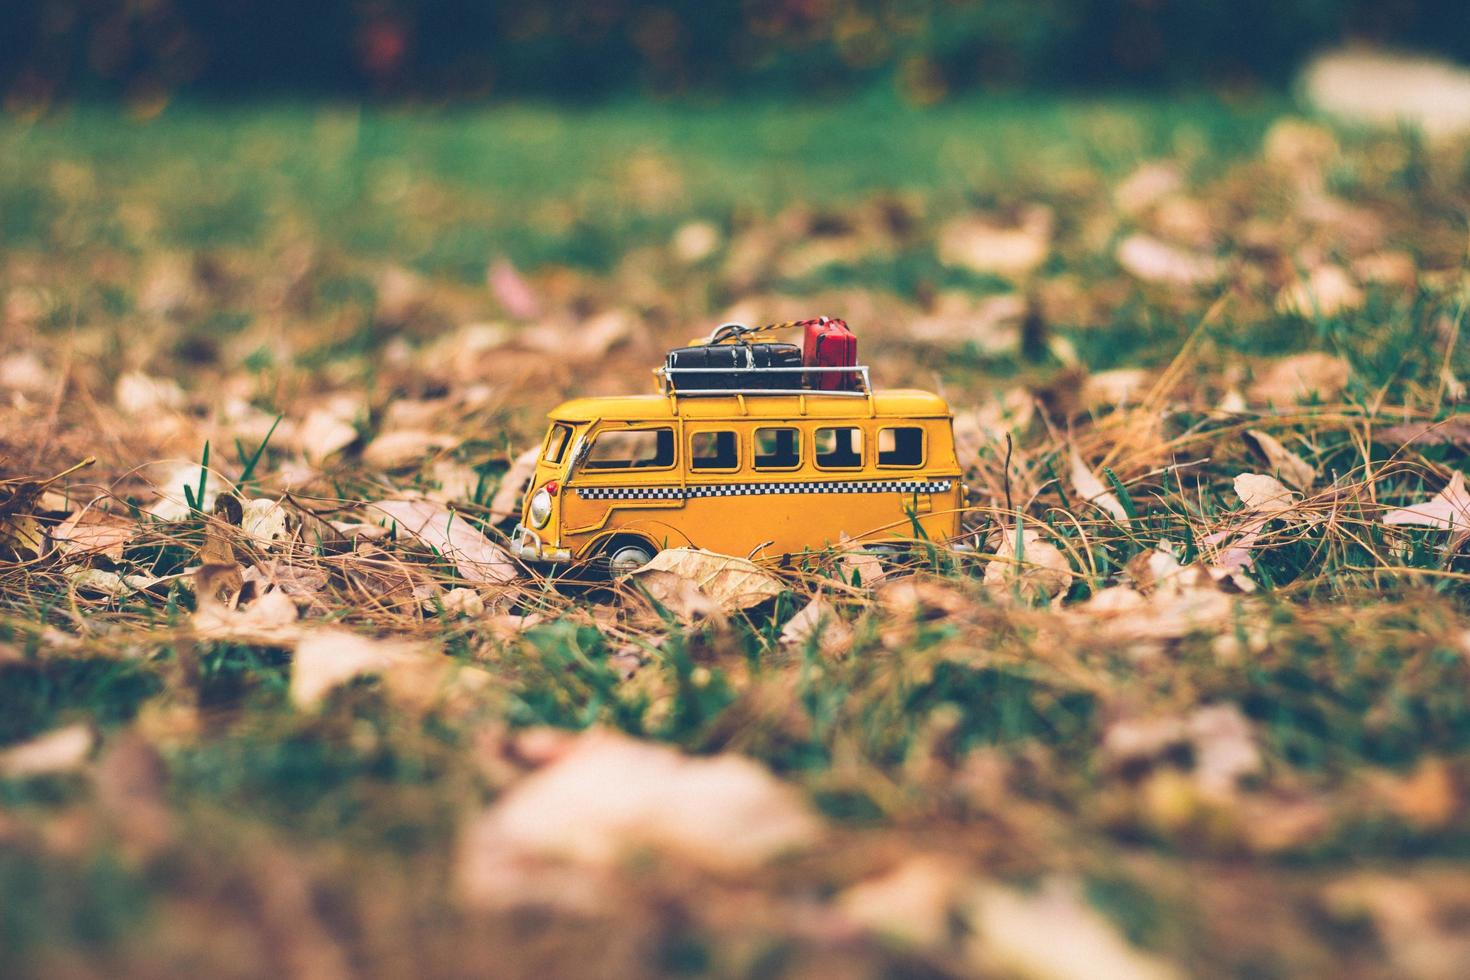 bus jouet jaune dans l'herbe photo